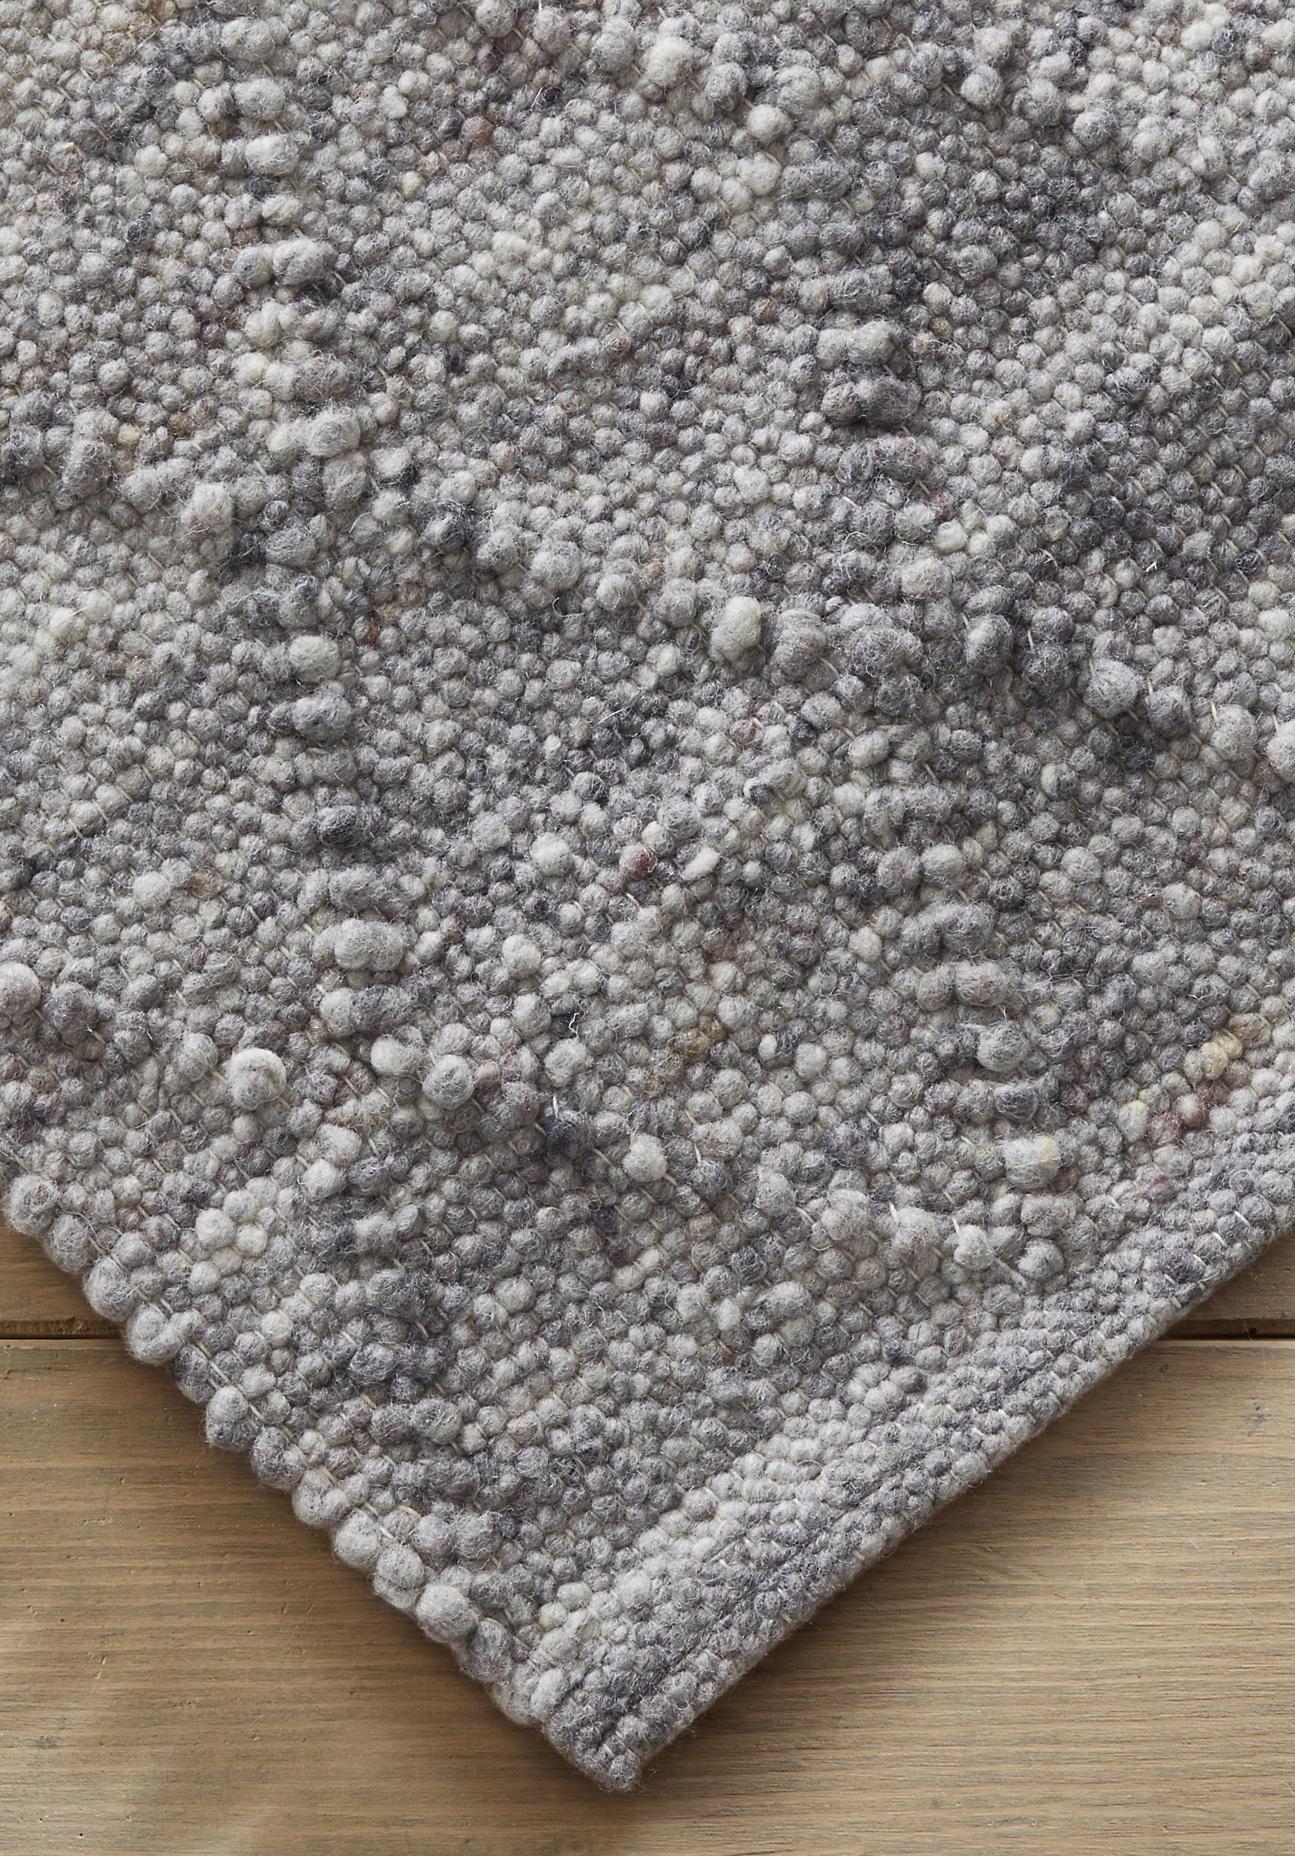 hessnatur Zopfmuster-Teppich Rhönschaf – grau – Größe 70x140 cm